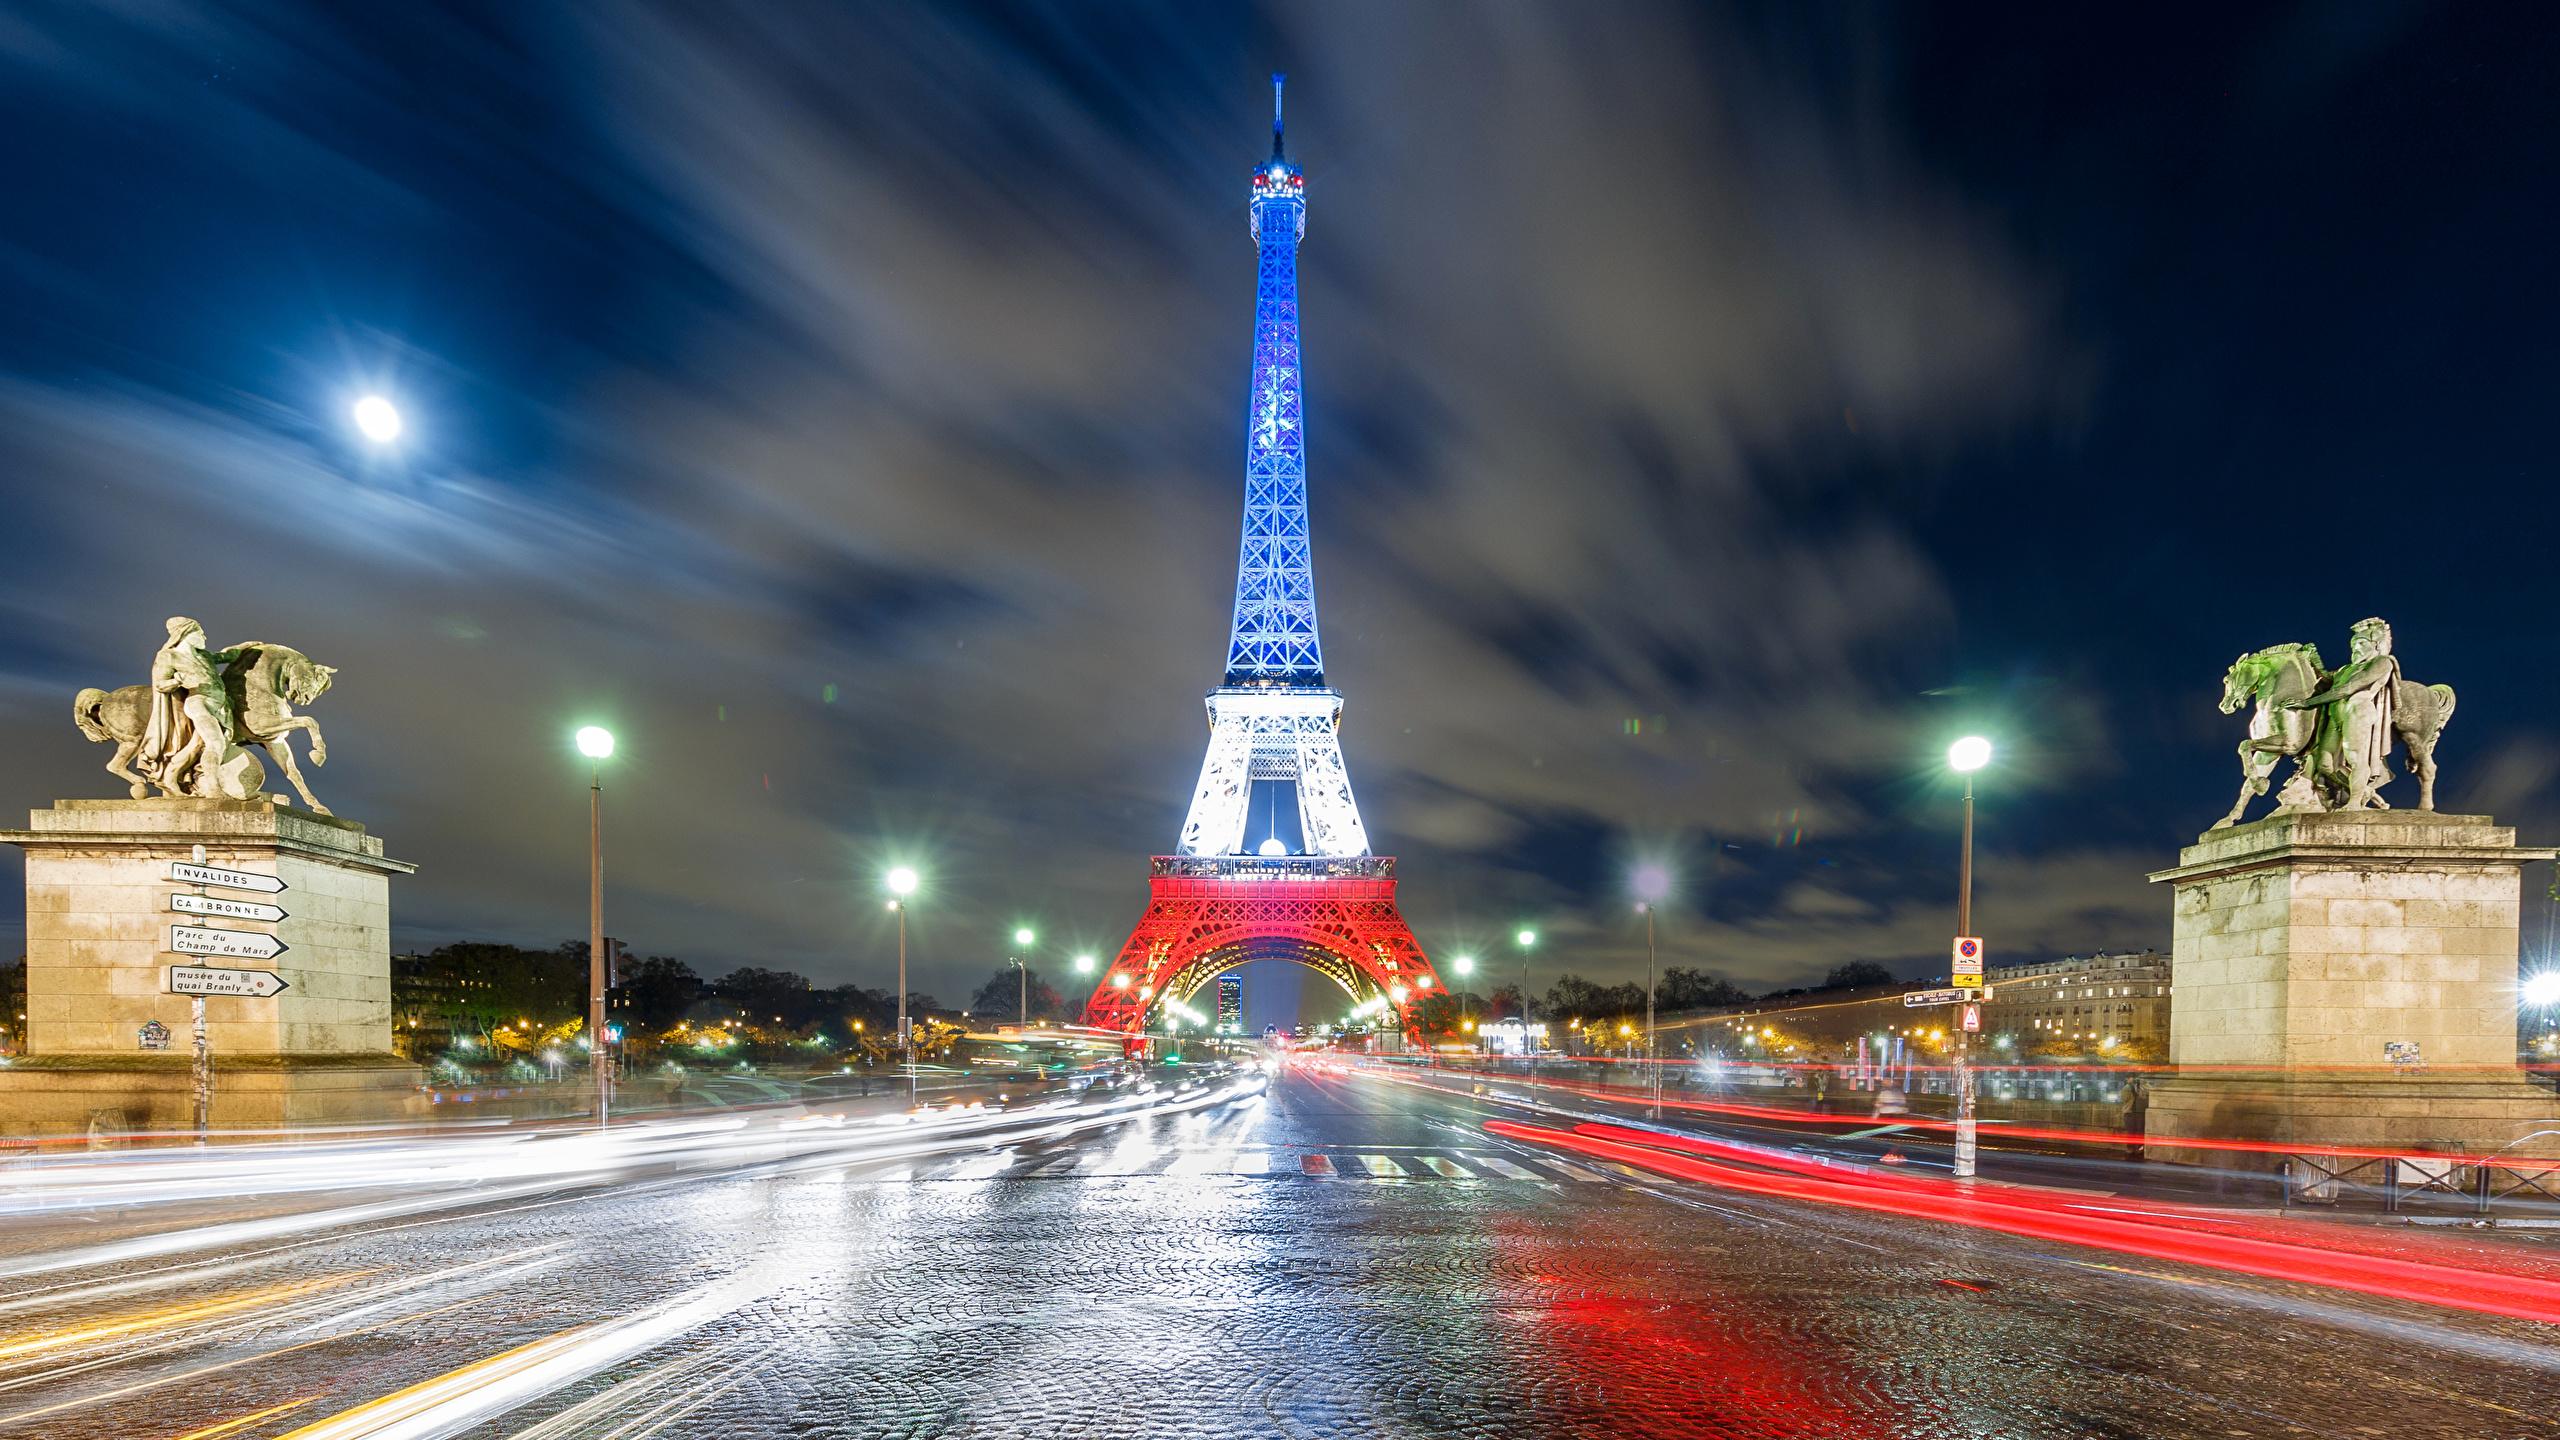 Франция дороги ночь фонари бесплатно